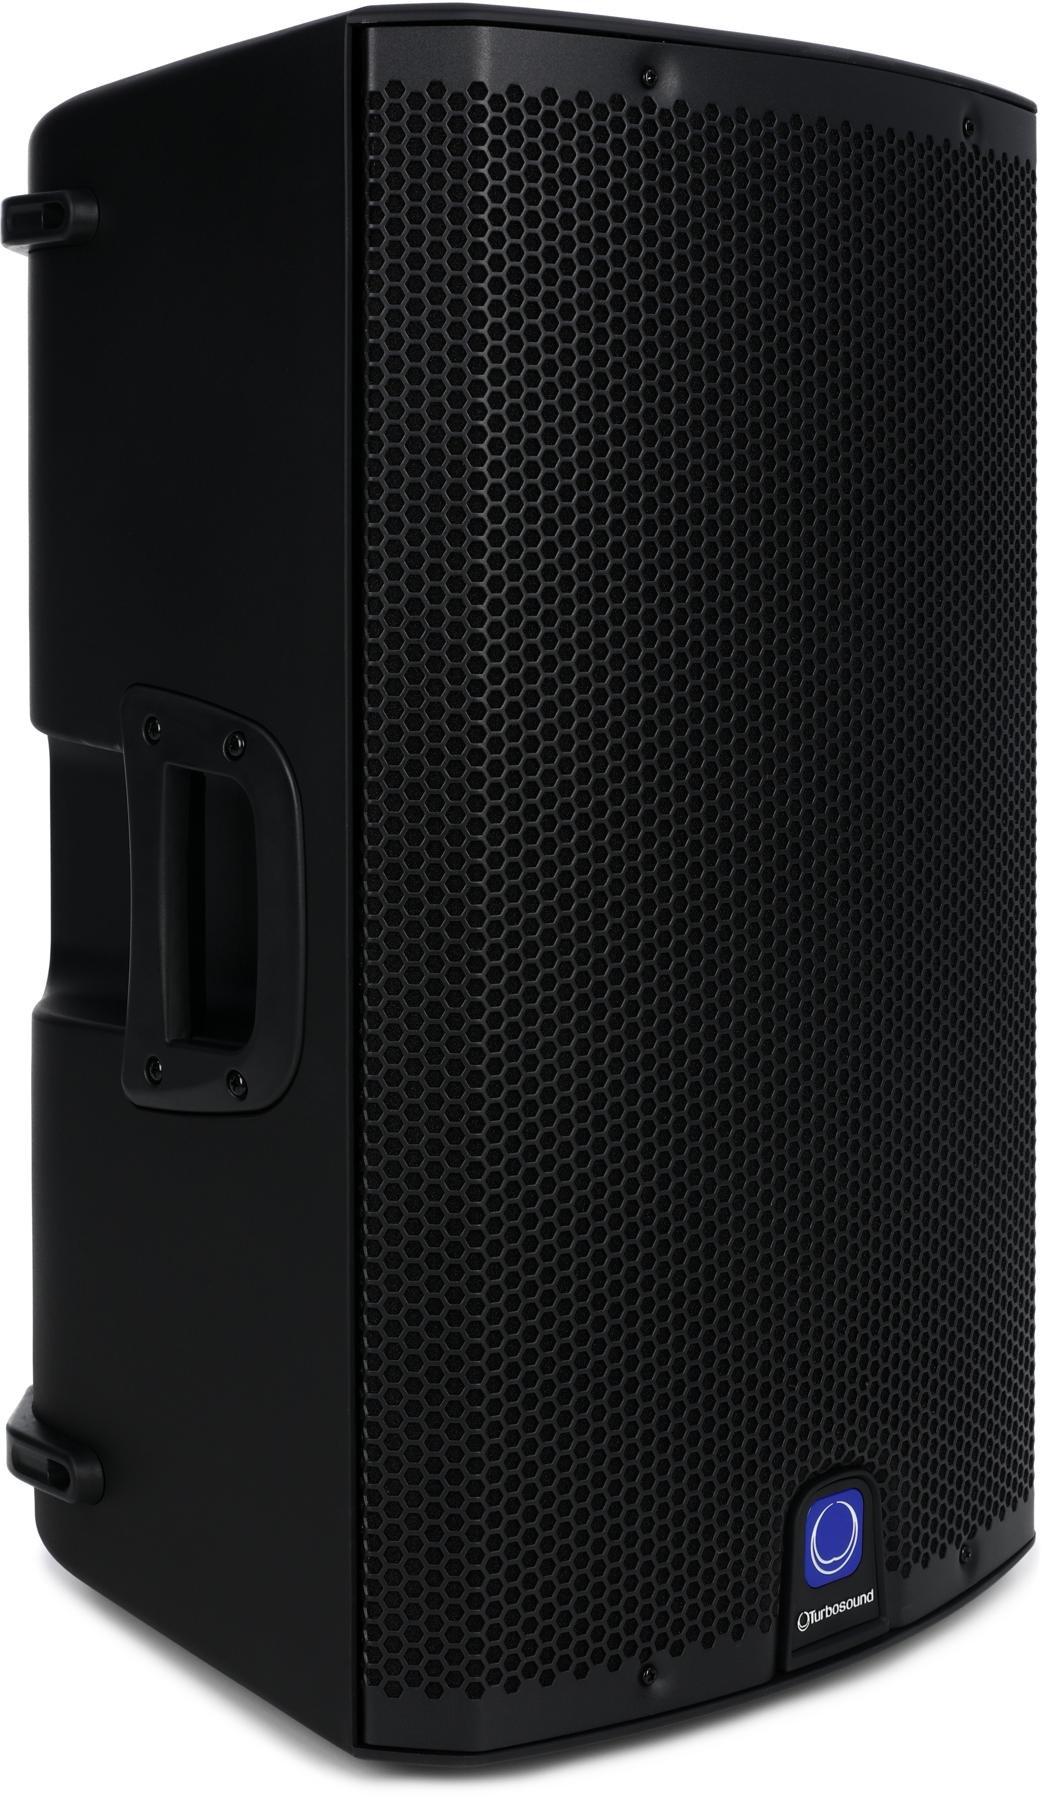 Turbosound Ix12 1000w 12 Powered Speaker Sweetwater Way Crossover Work Also Jbl Speakers 3 Diagrams Image 1